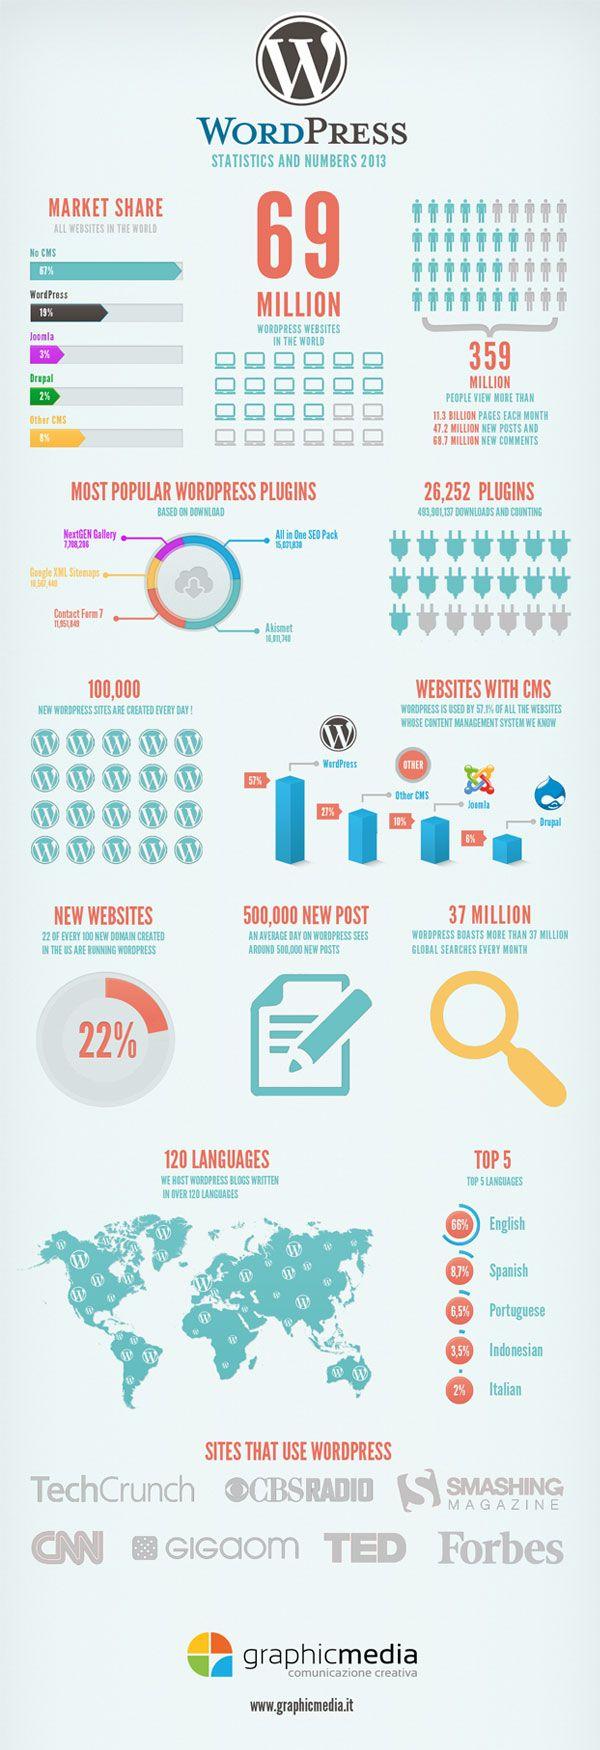 WordPress statistics and numbers 2013 #infografia #infographic #socialmedia